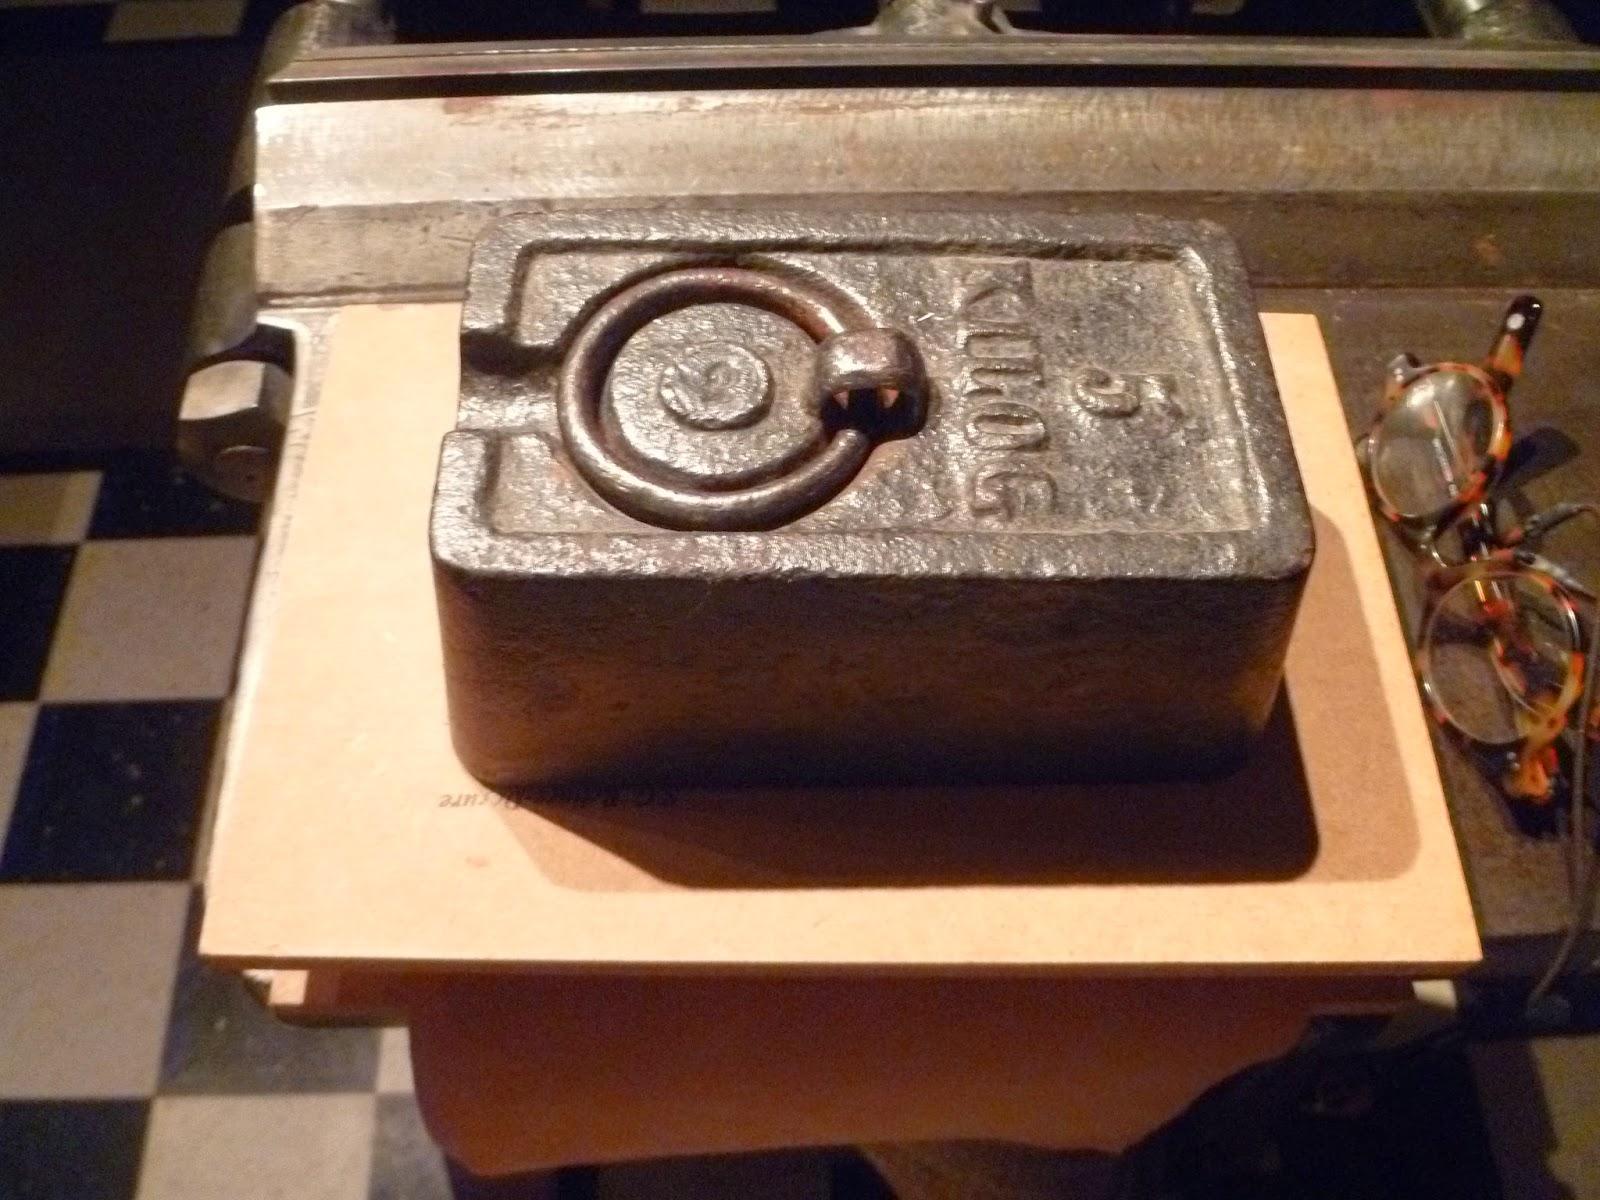 Restauration de livres anciens.: Vérification des mors des cartons #B27219